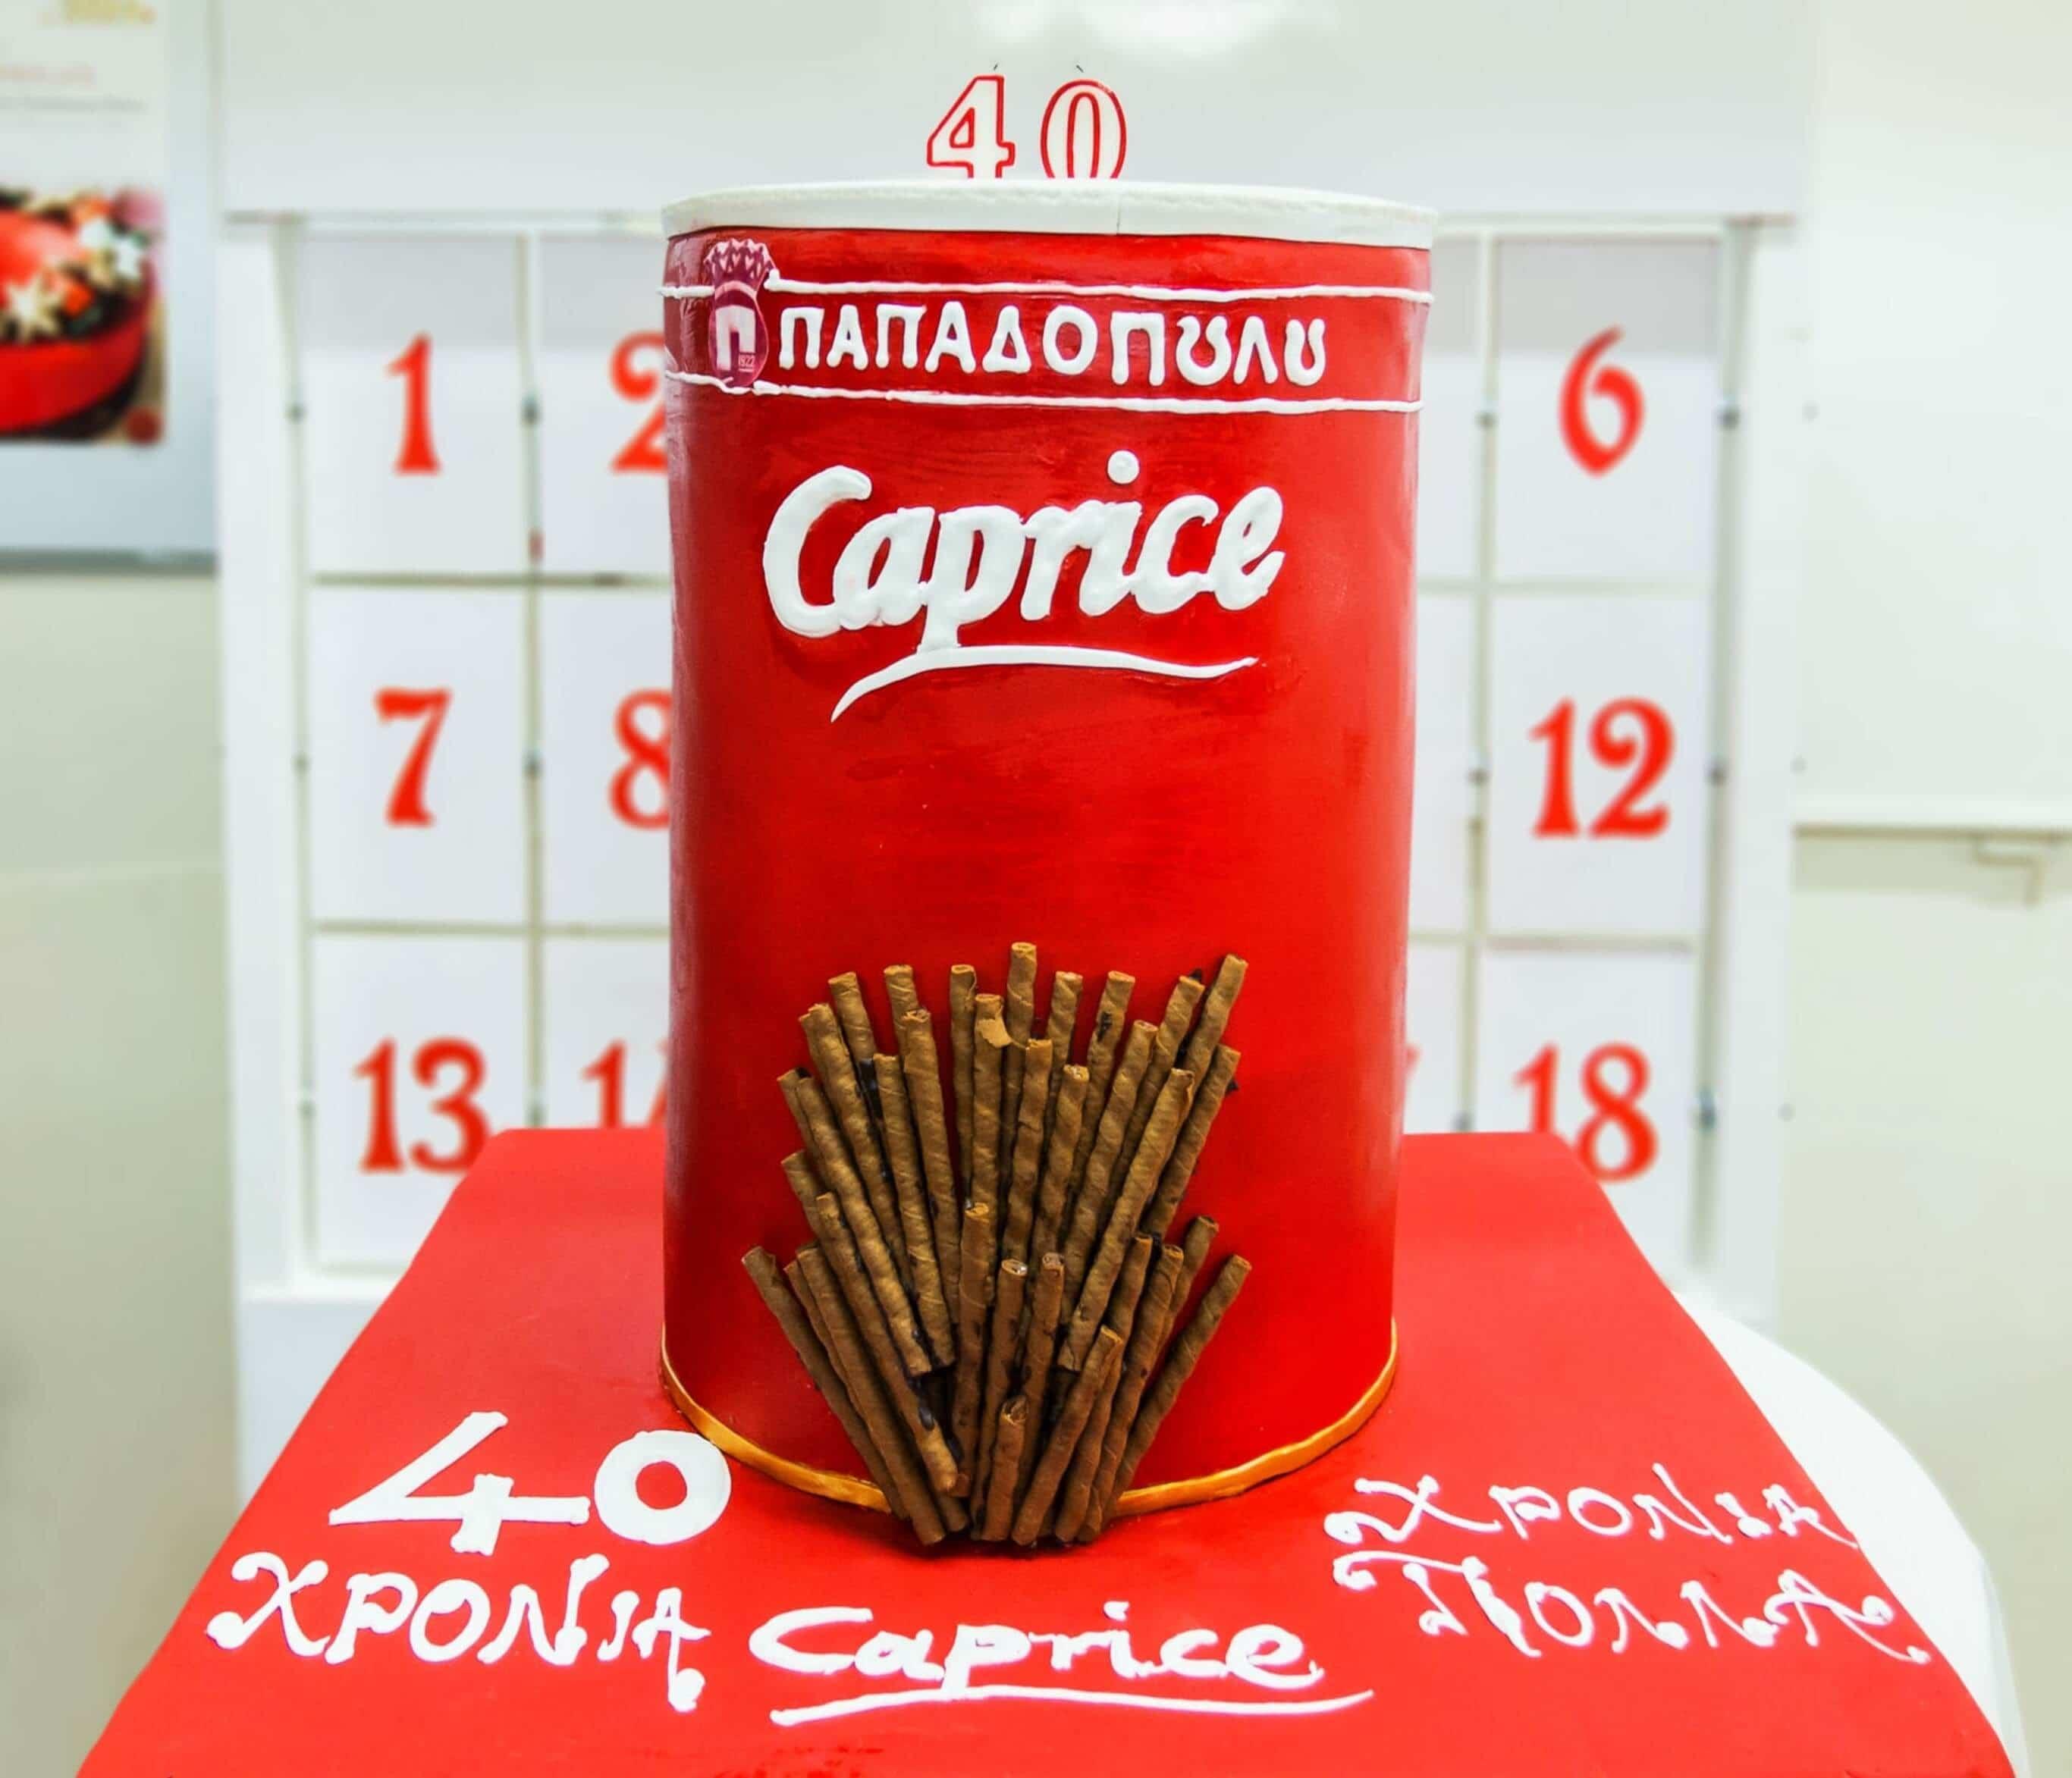 image for 40 χρόνια Caprice Παπαδοπούλου: Η πιο γλυκιά ιστορία ξεκινάει από τον Βόλο και φτάνει… σε ολόκληρο τον κόσμο!